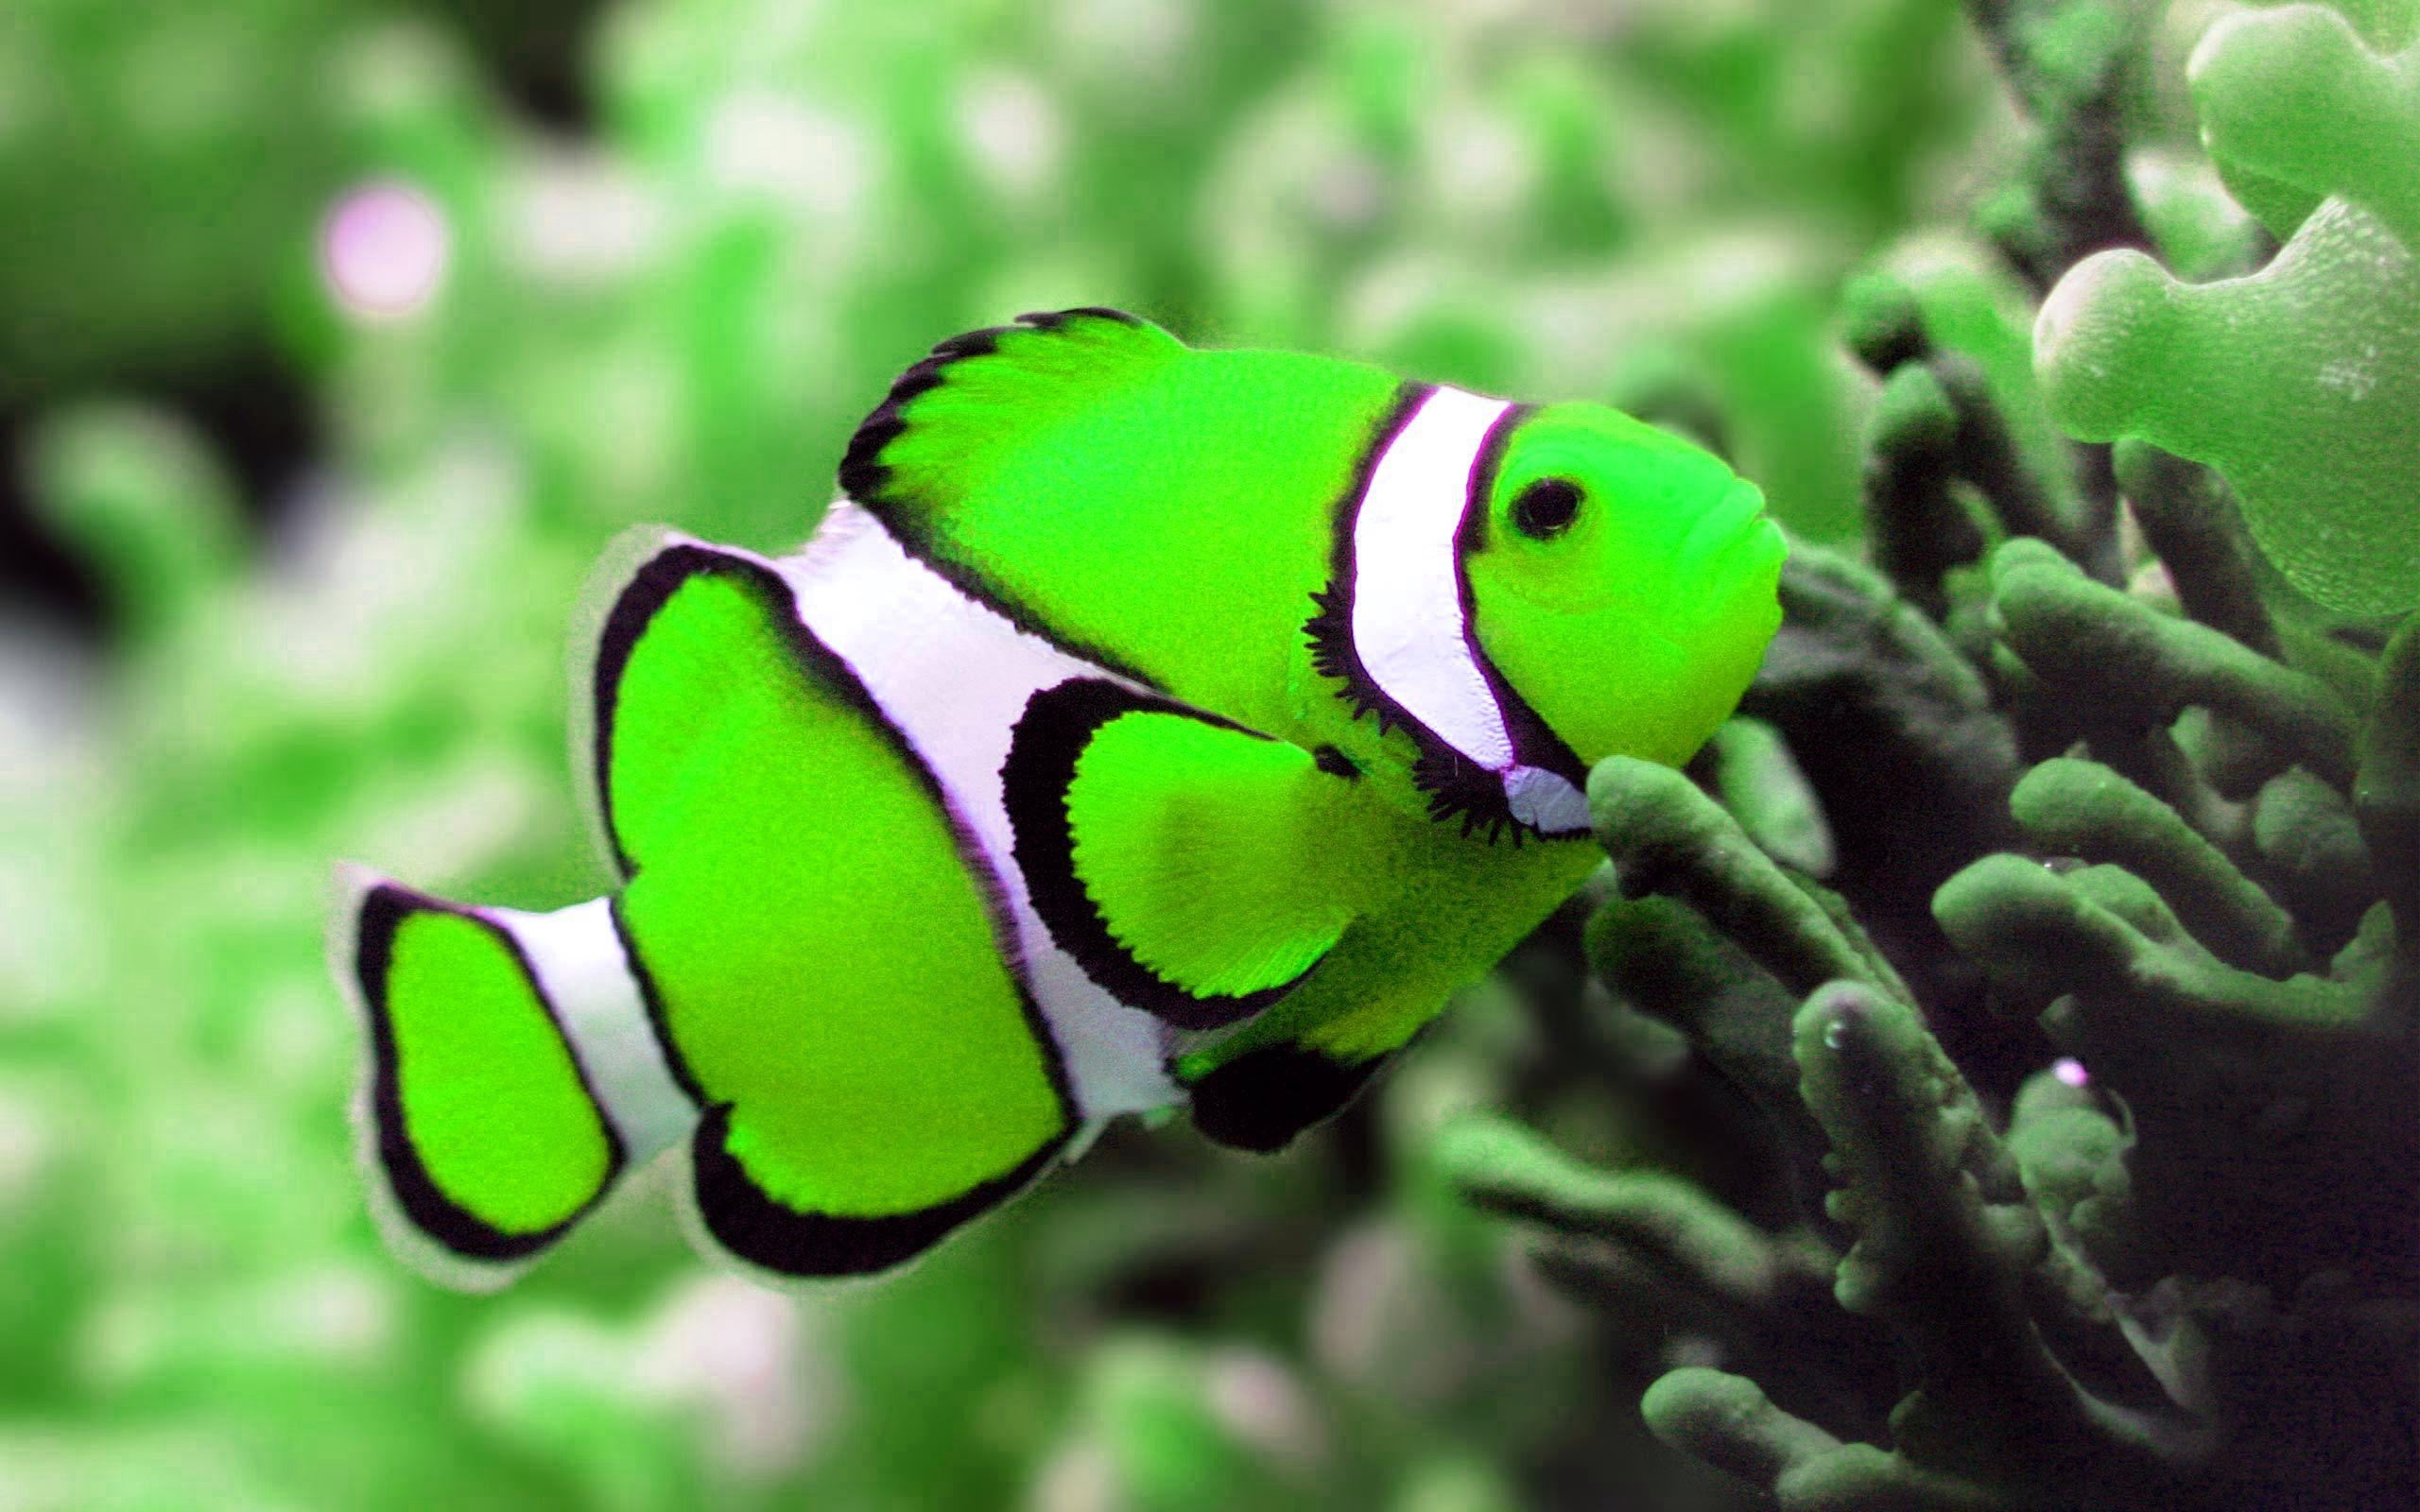 Pin by EriNa on WaterWorld | Pinterest | Princess fiona, Fish ...